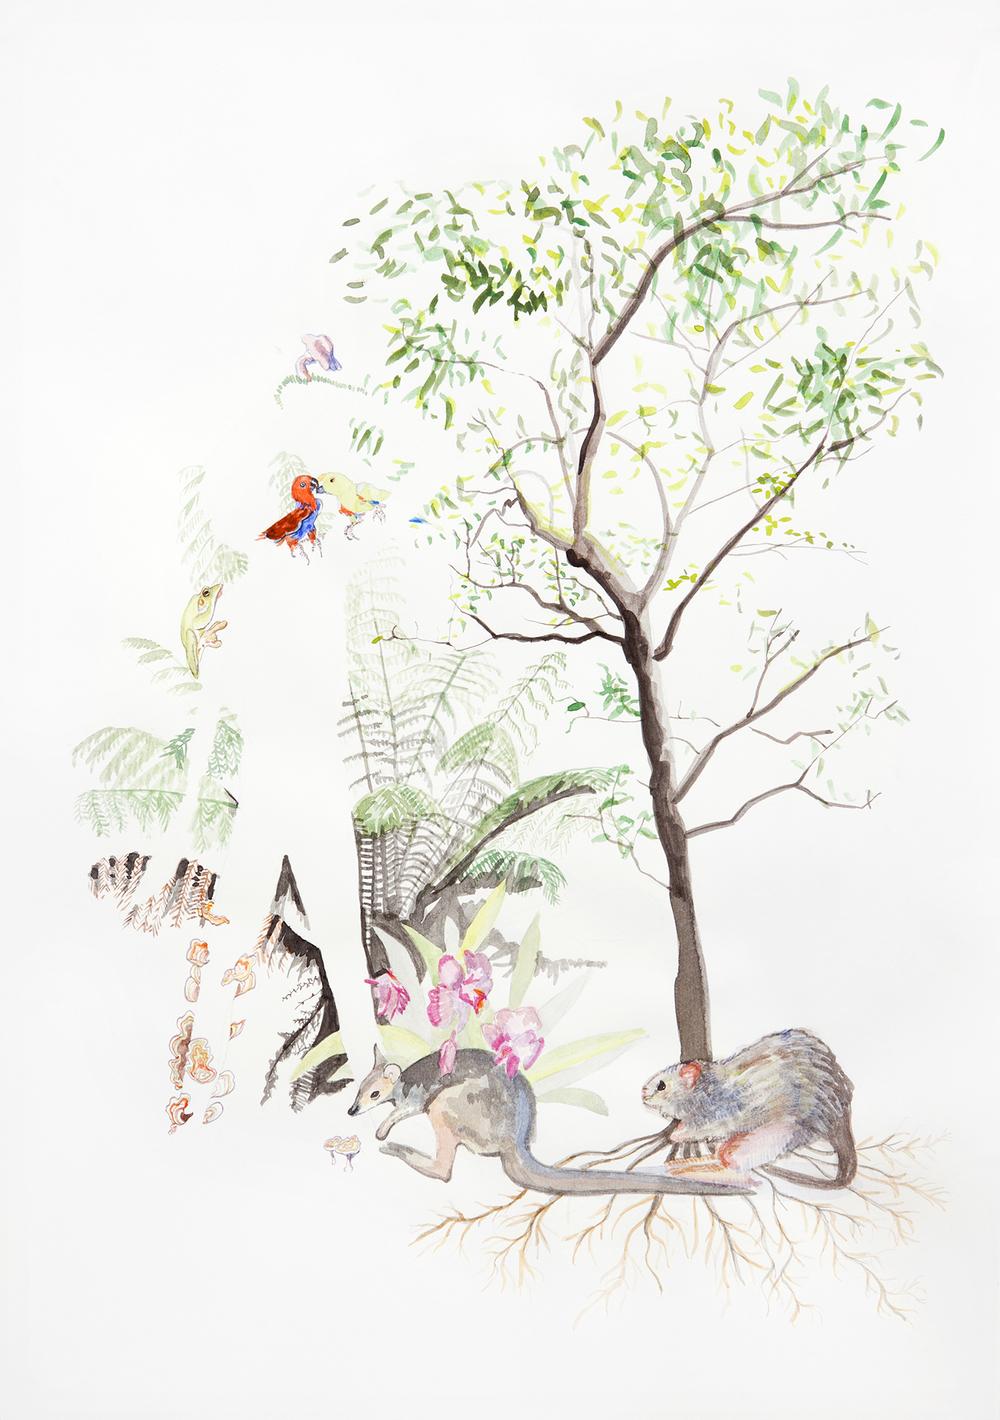 Australian at Heart? #1, 2011, Watercolour on paper, 21.0 x 29.5 cm, Photo: Sam Scoufos